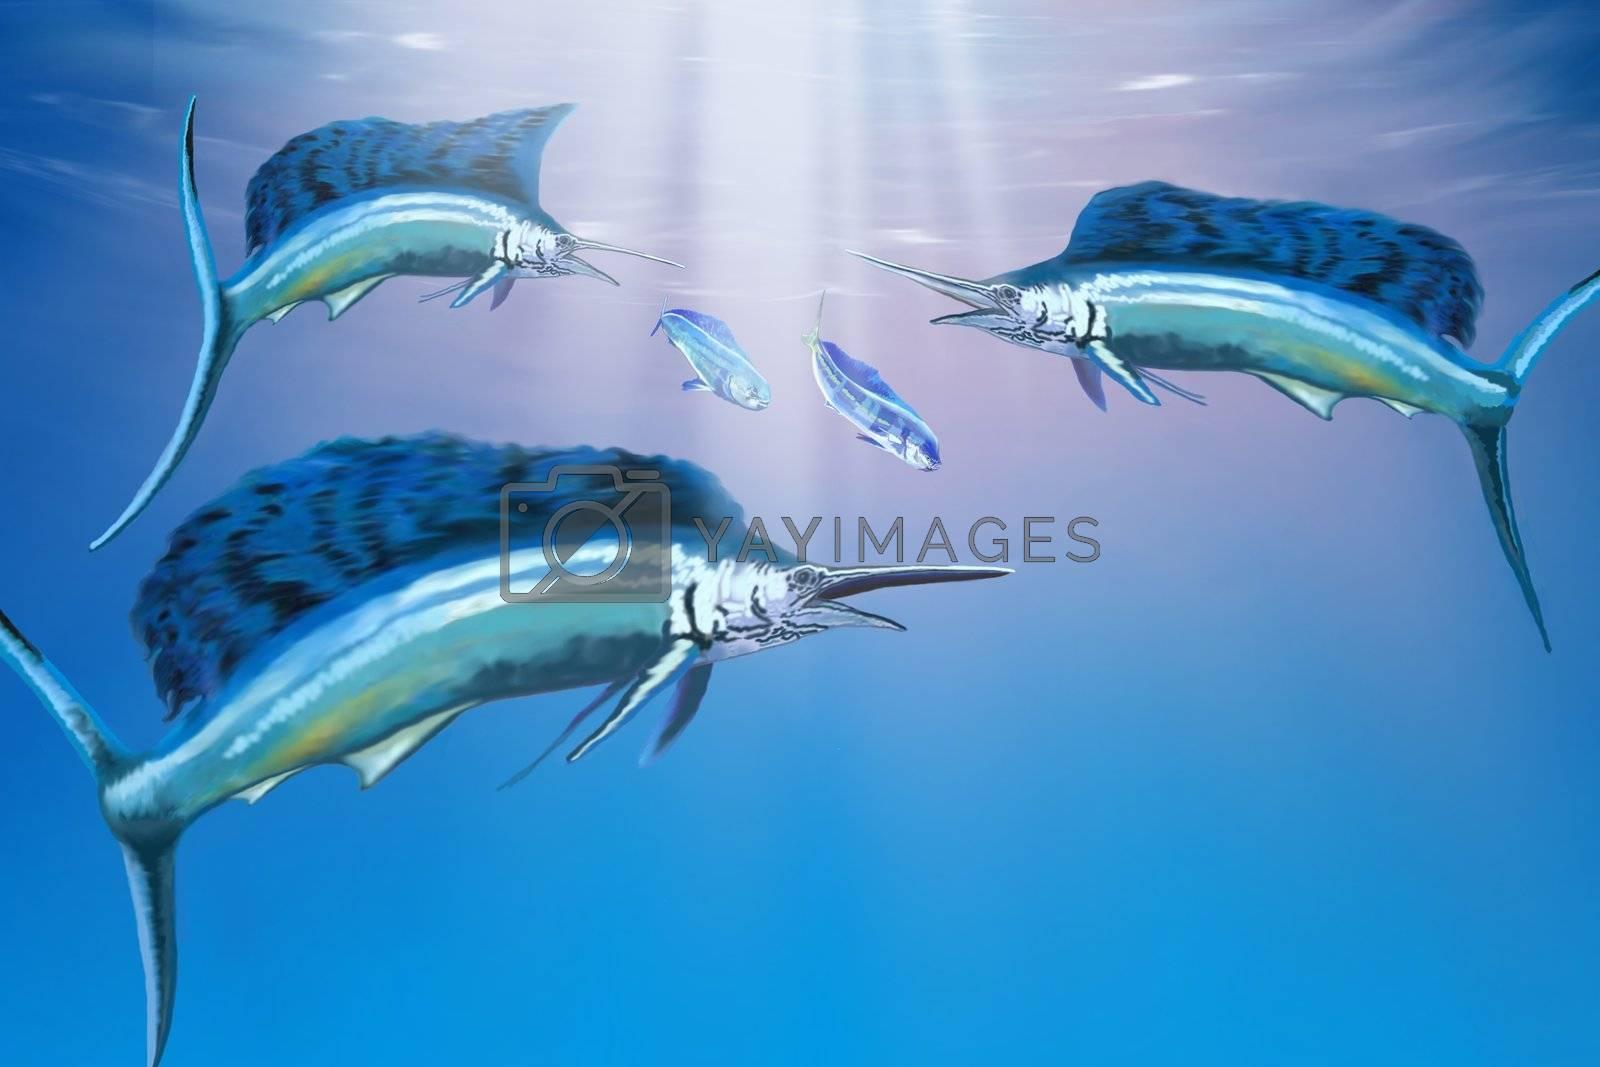 Three sailfish hunt for their prey.